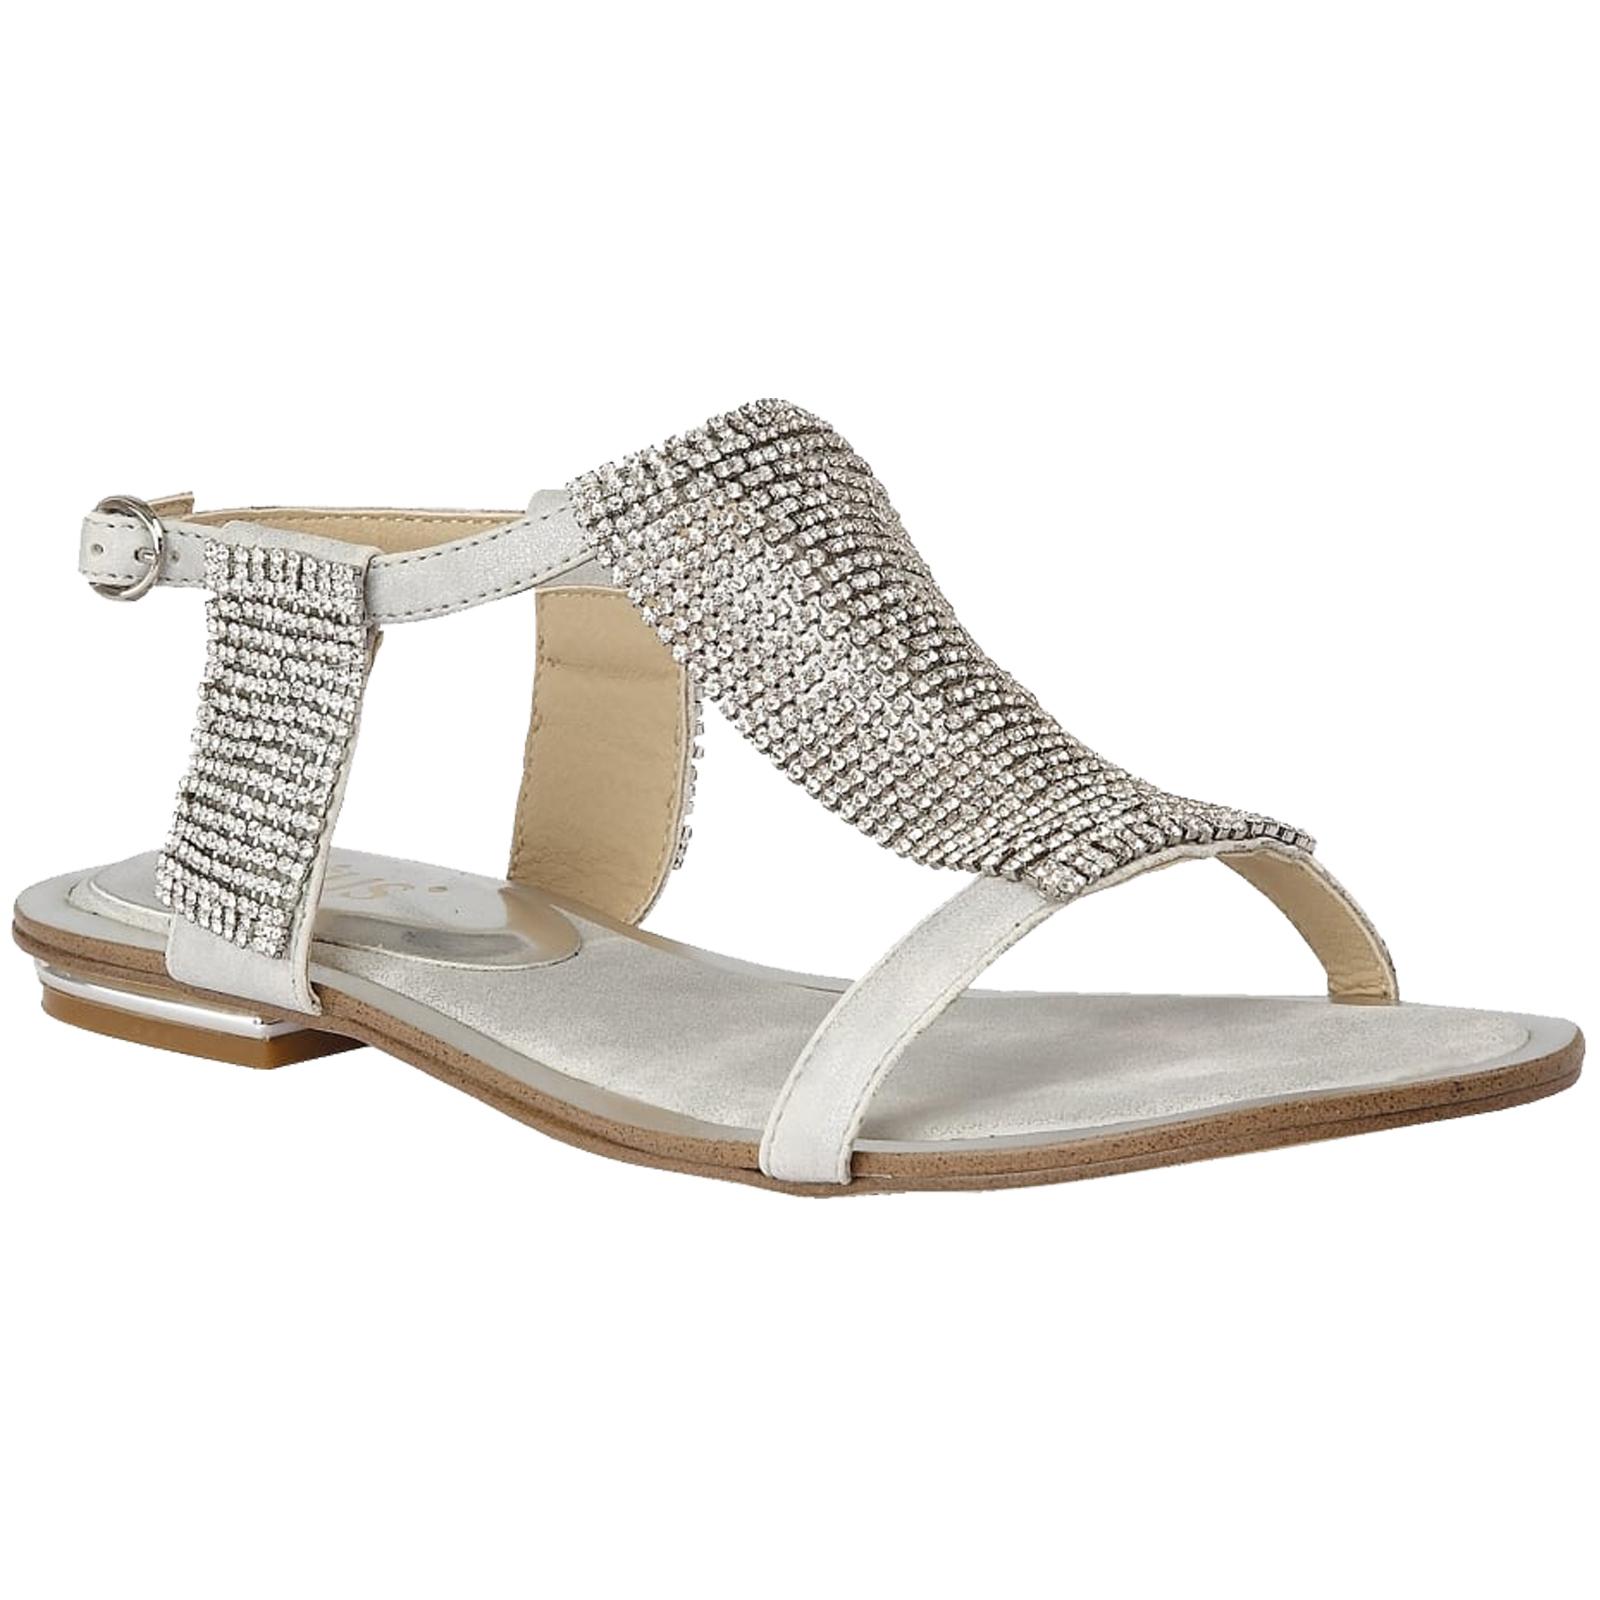 Silver diamante flat sandals original cheap online outlet cost cheap discount sale cheap sale official clearance online cheap real UzuKUC